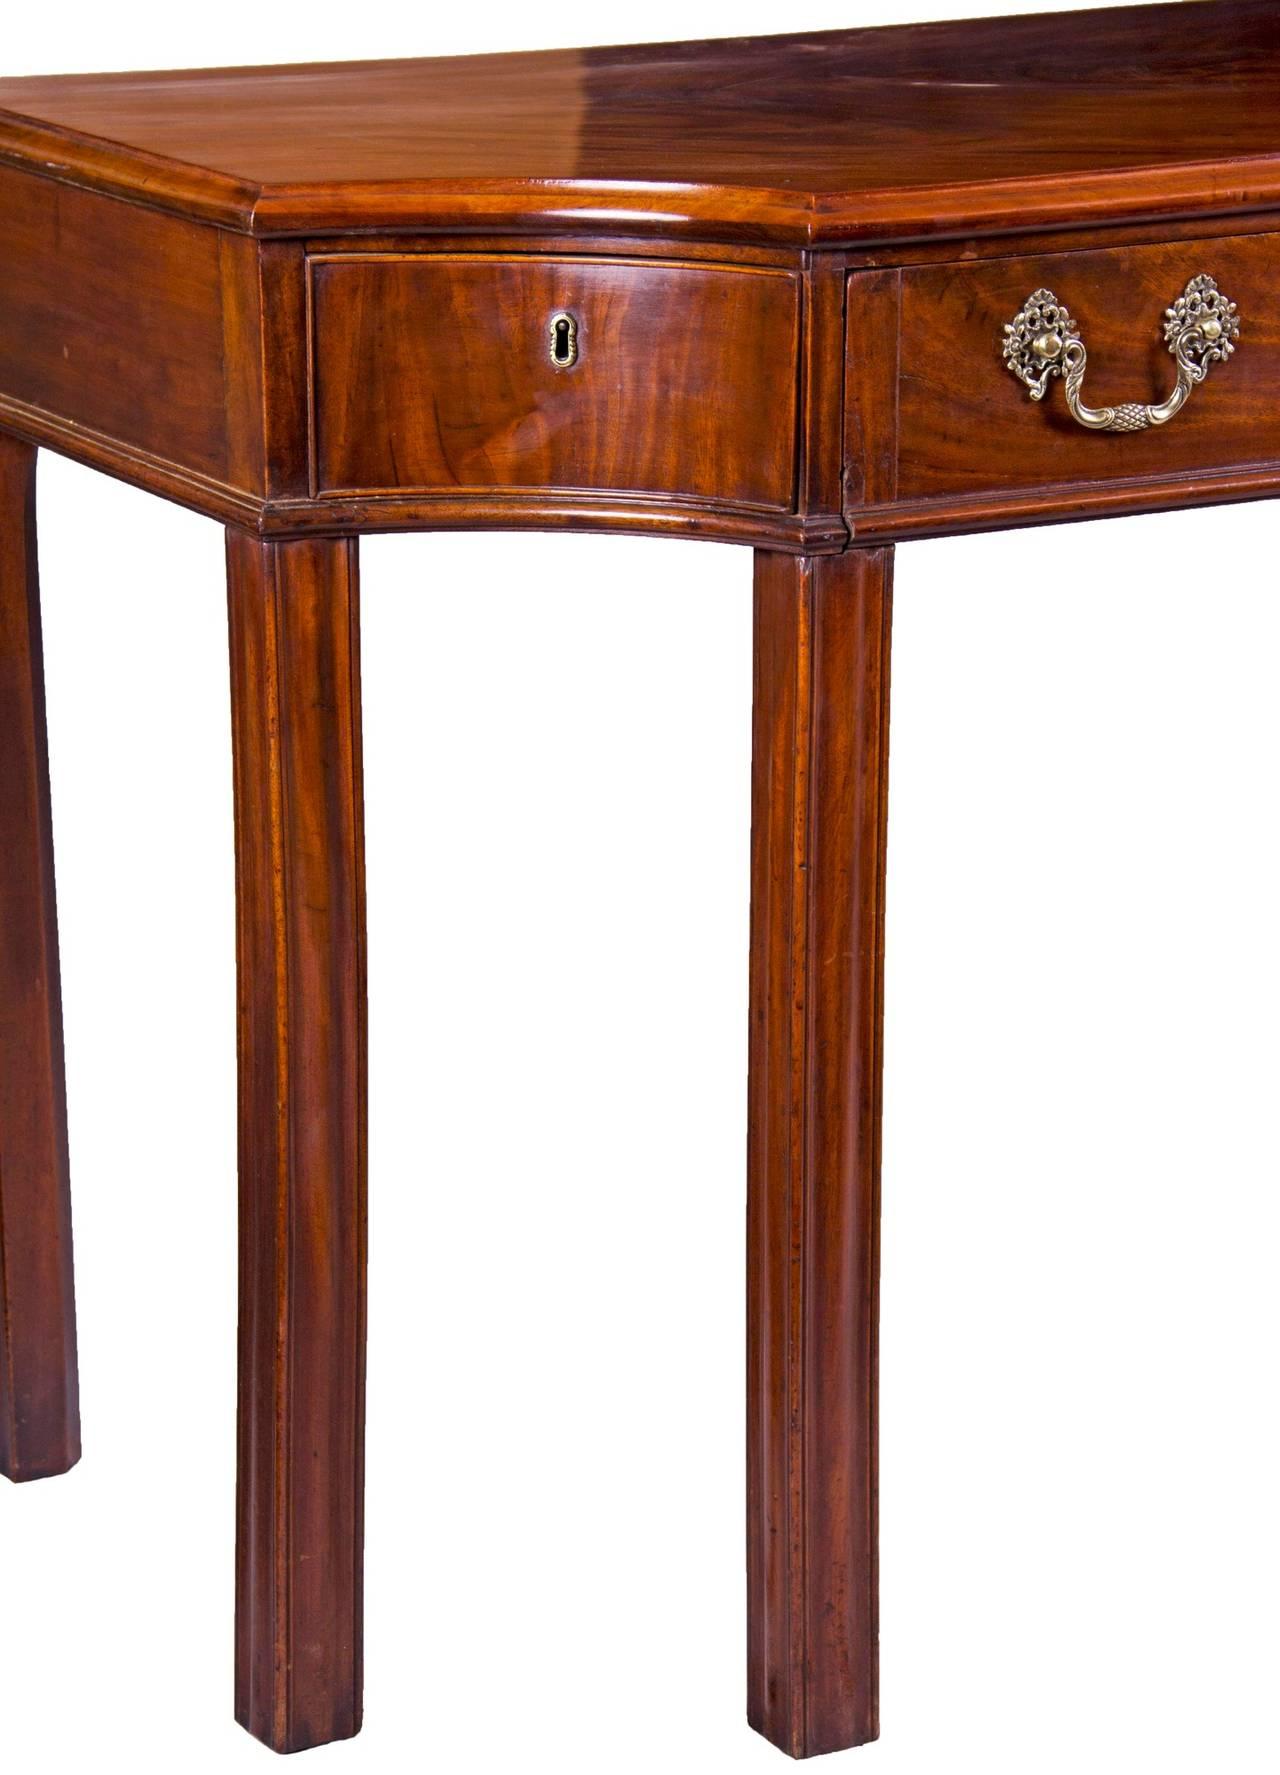 English Mahogany George III Console Table / Telescopic Reading Table, circa 1790 For Sale